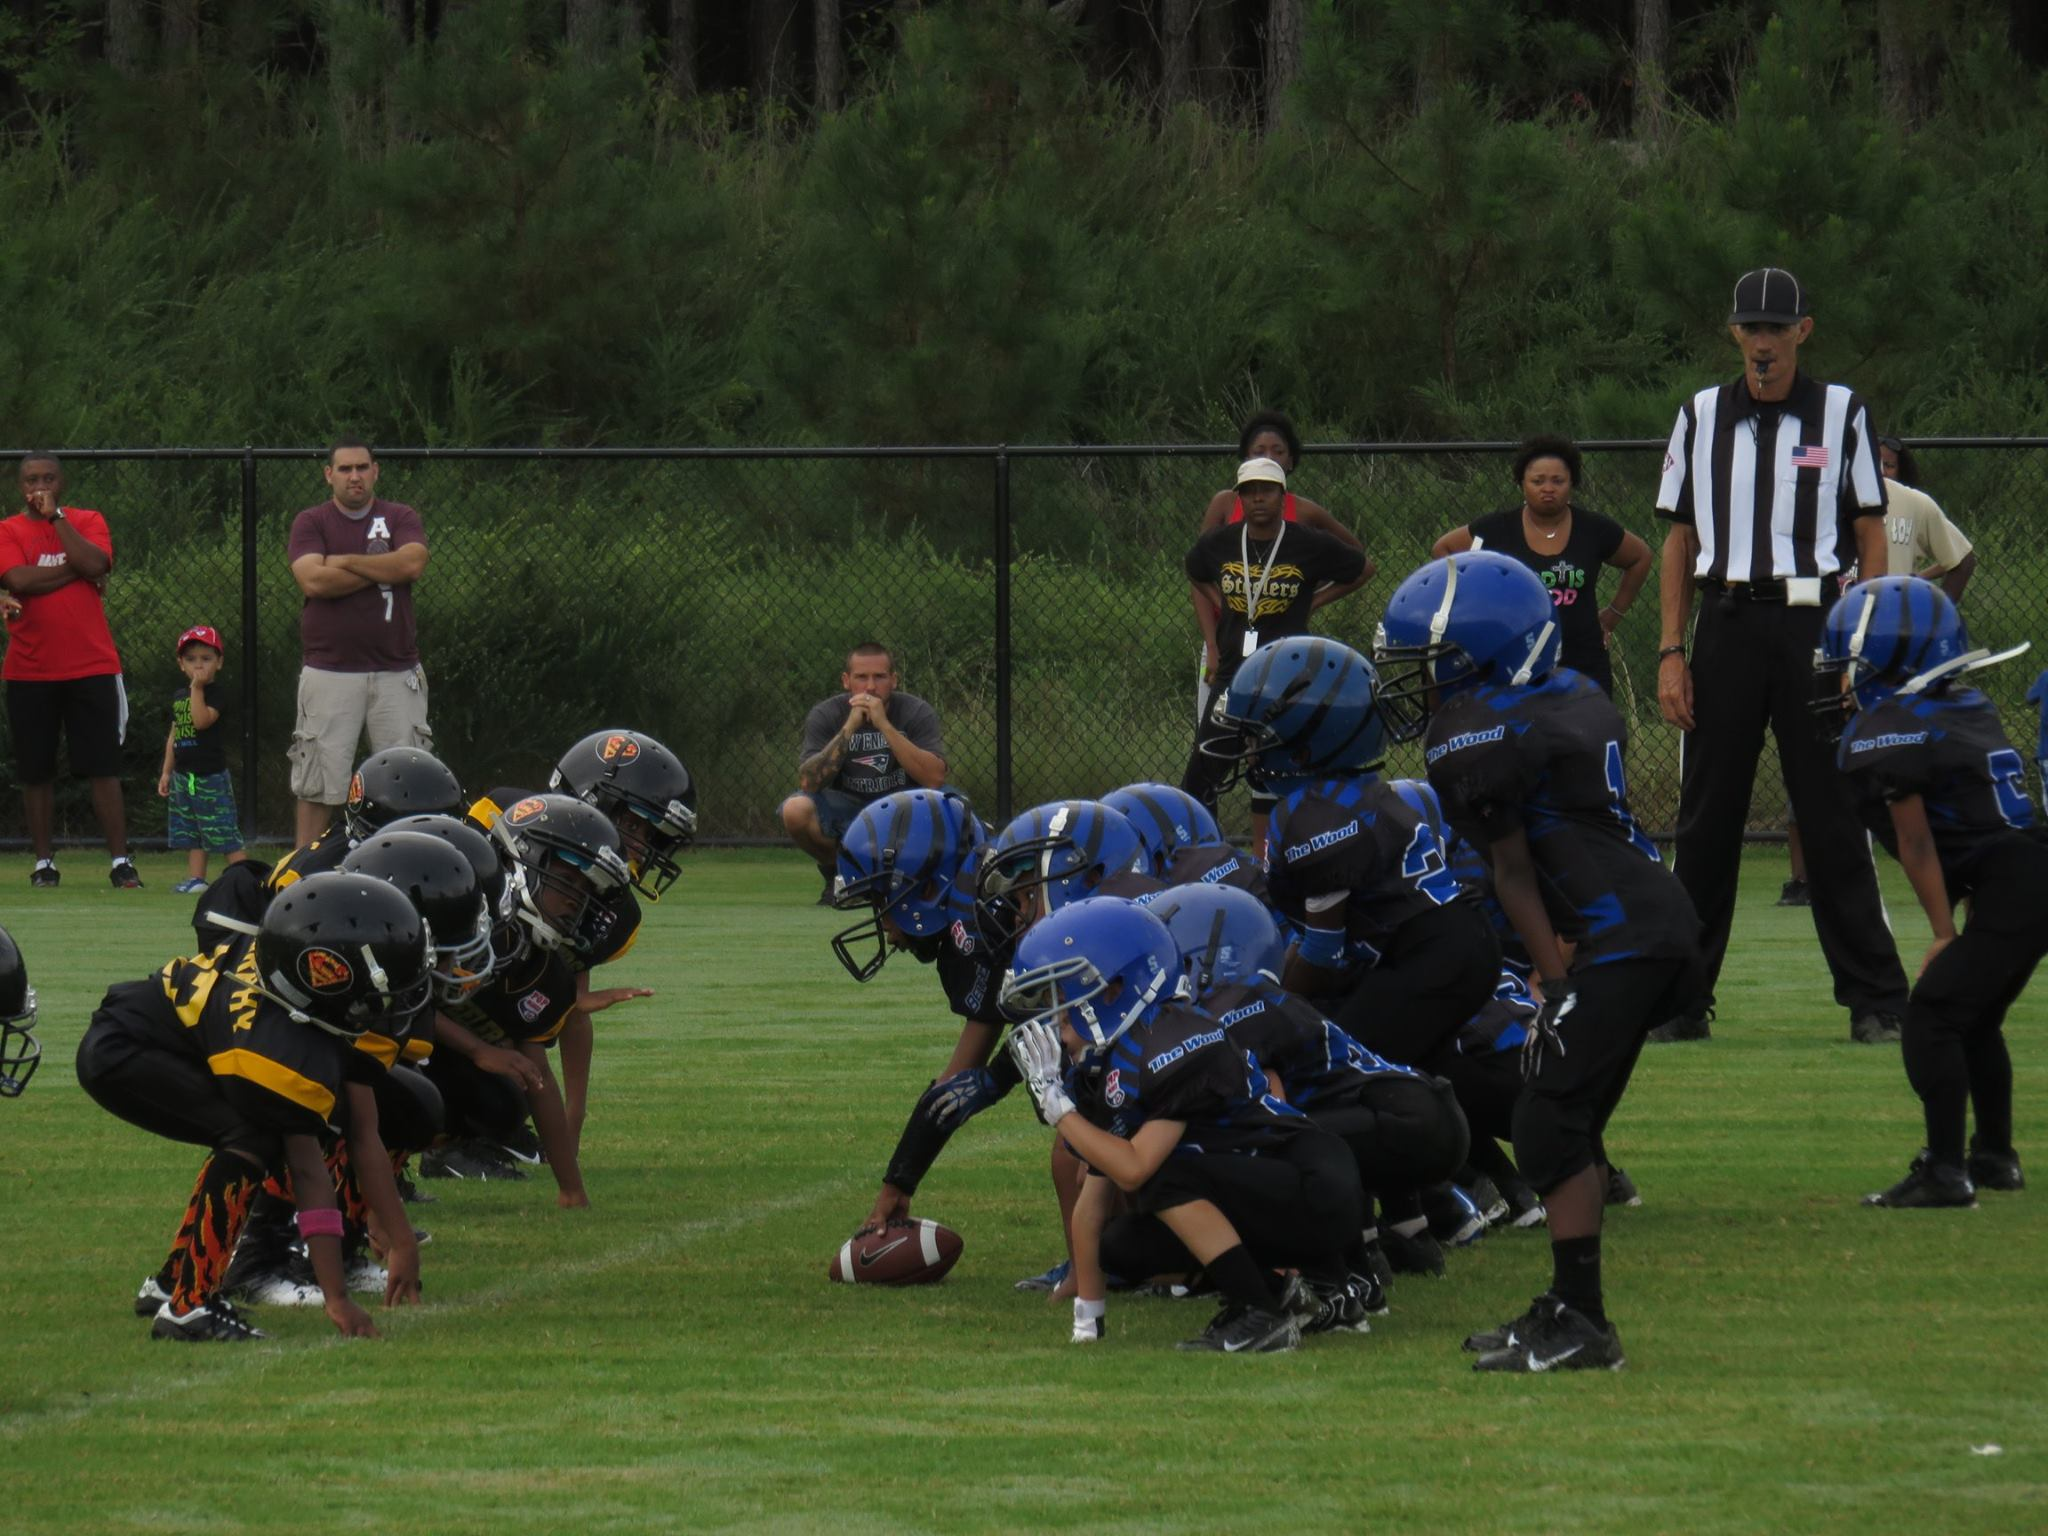 Blythewood Youth Football and Cheer